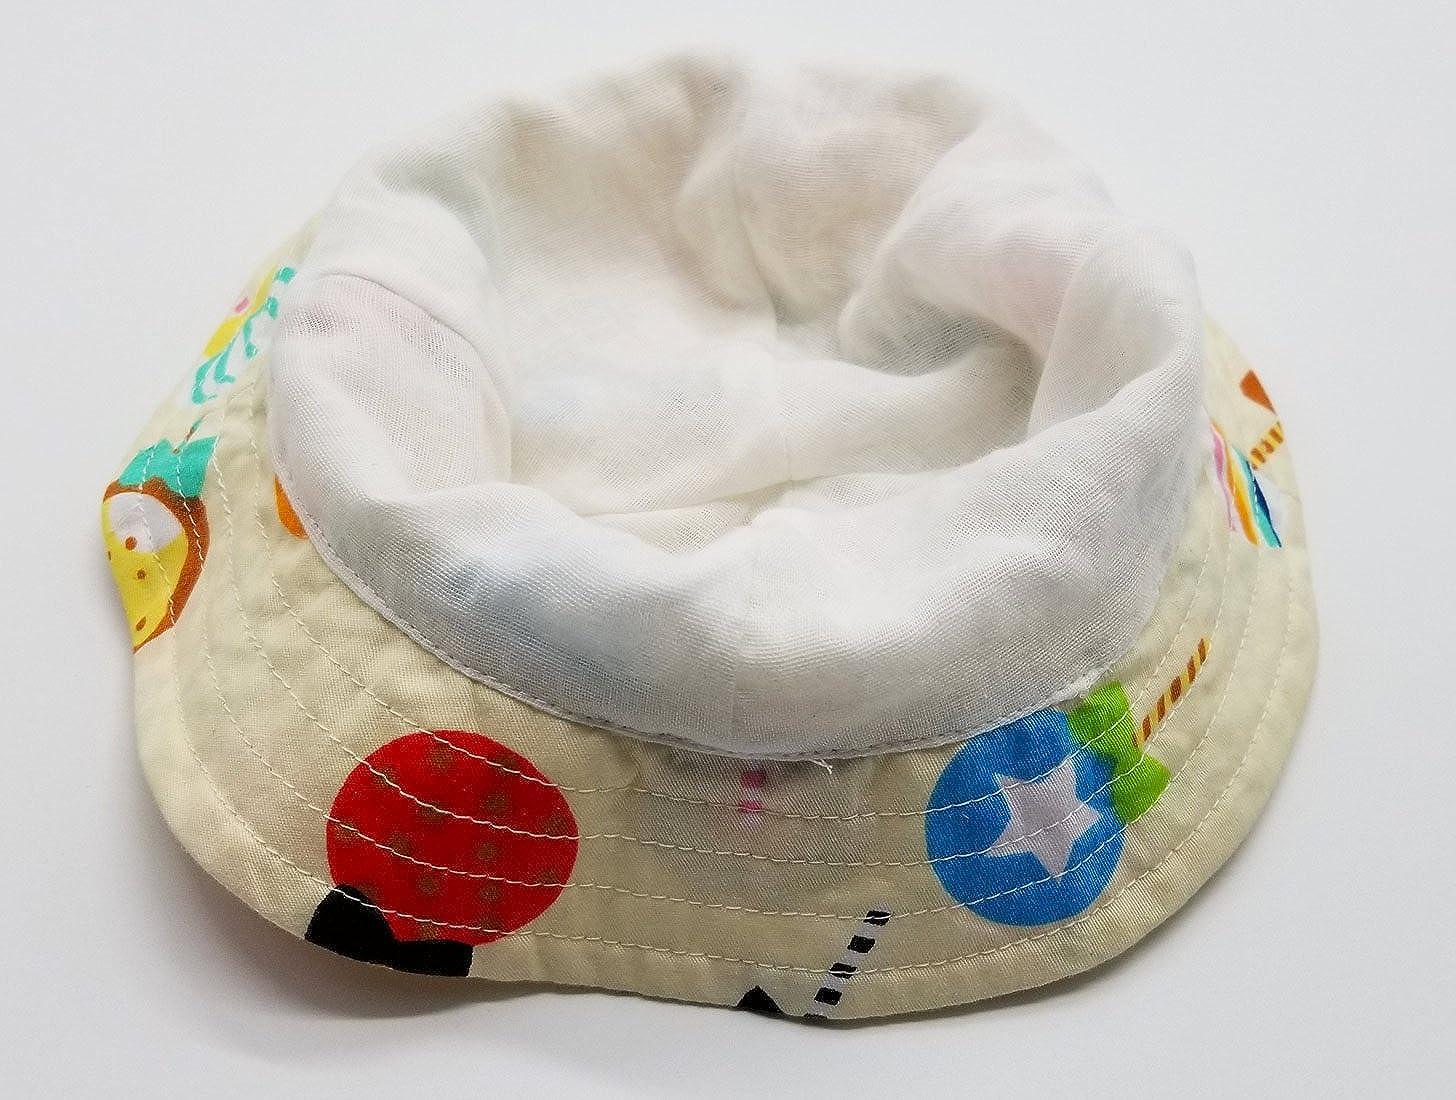 Beichangchang Baby Toddler Kids Summer Hat Sun Protective Wide Brim Bucket Hat